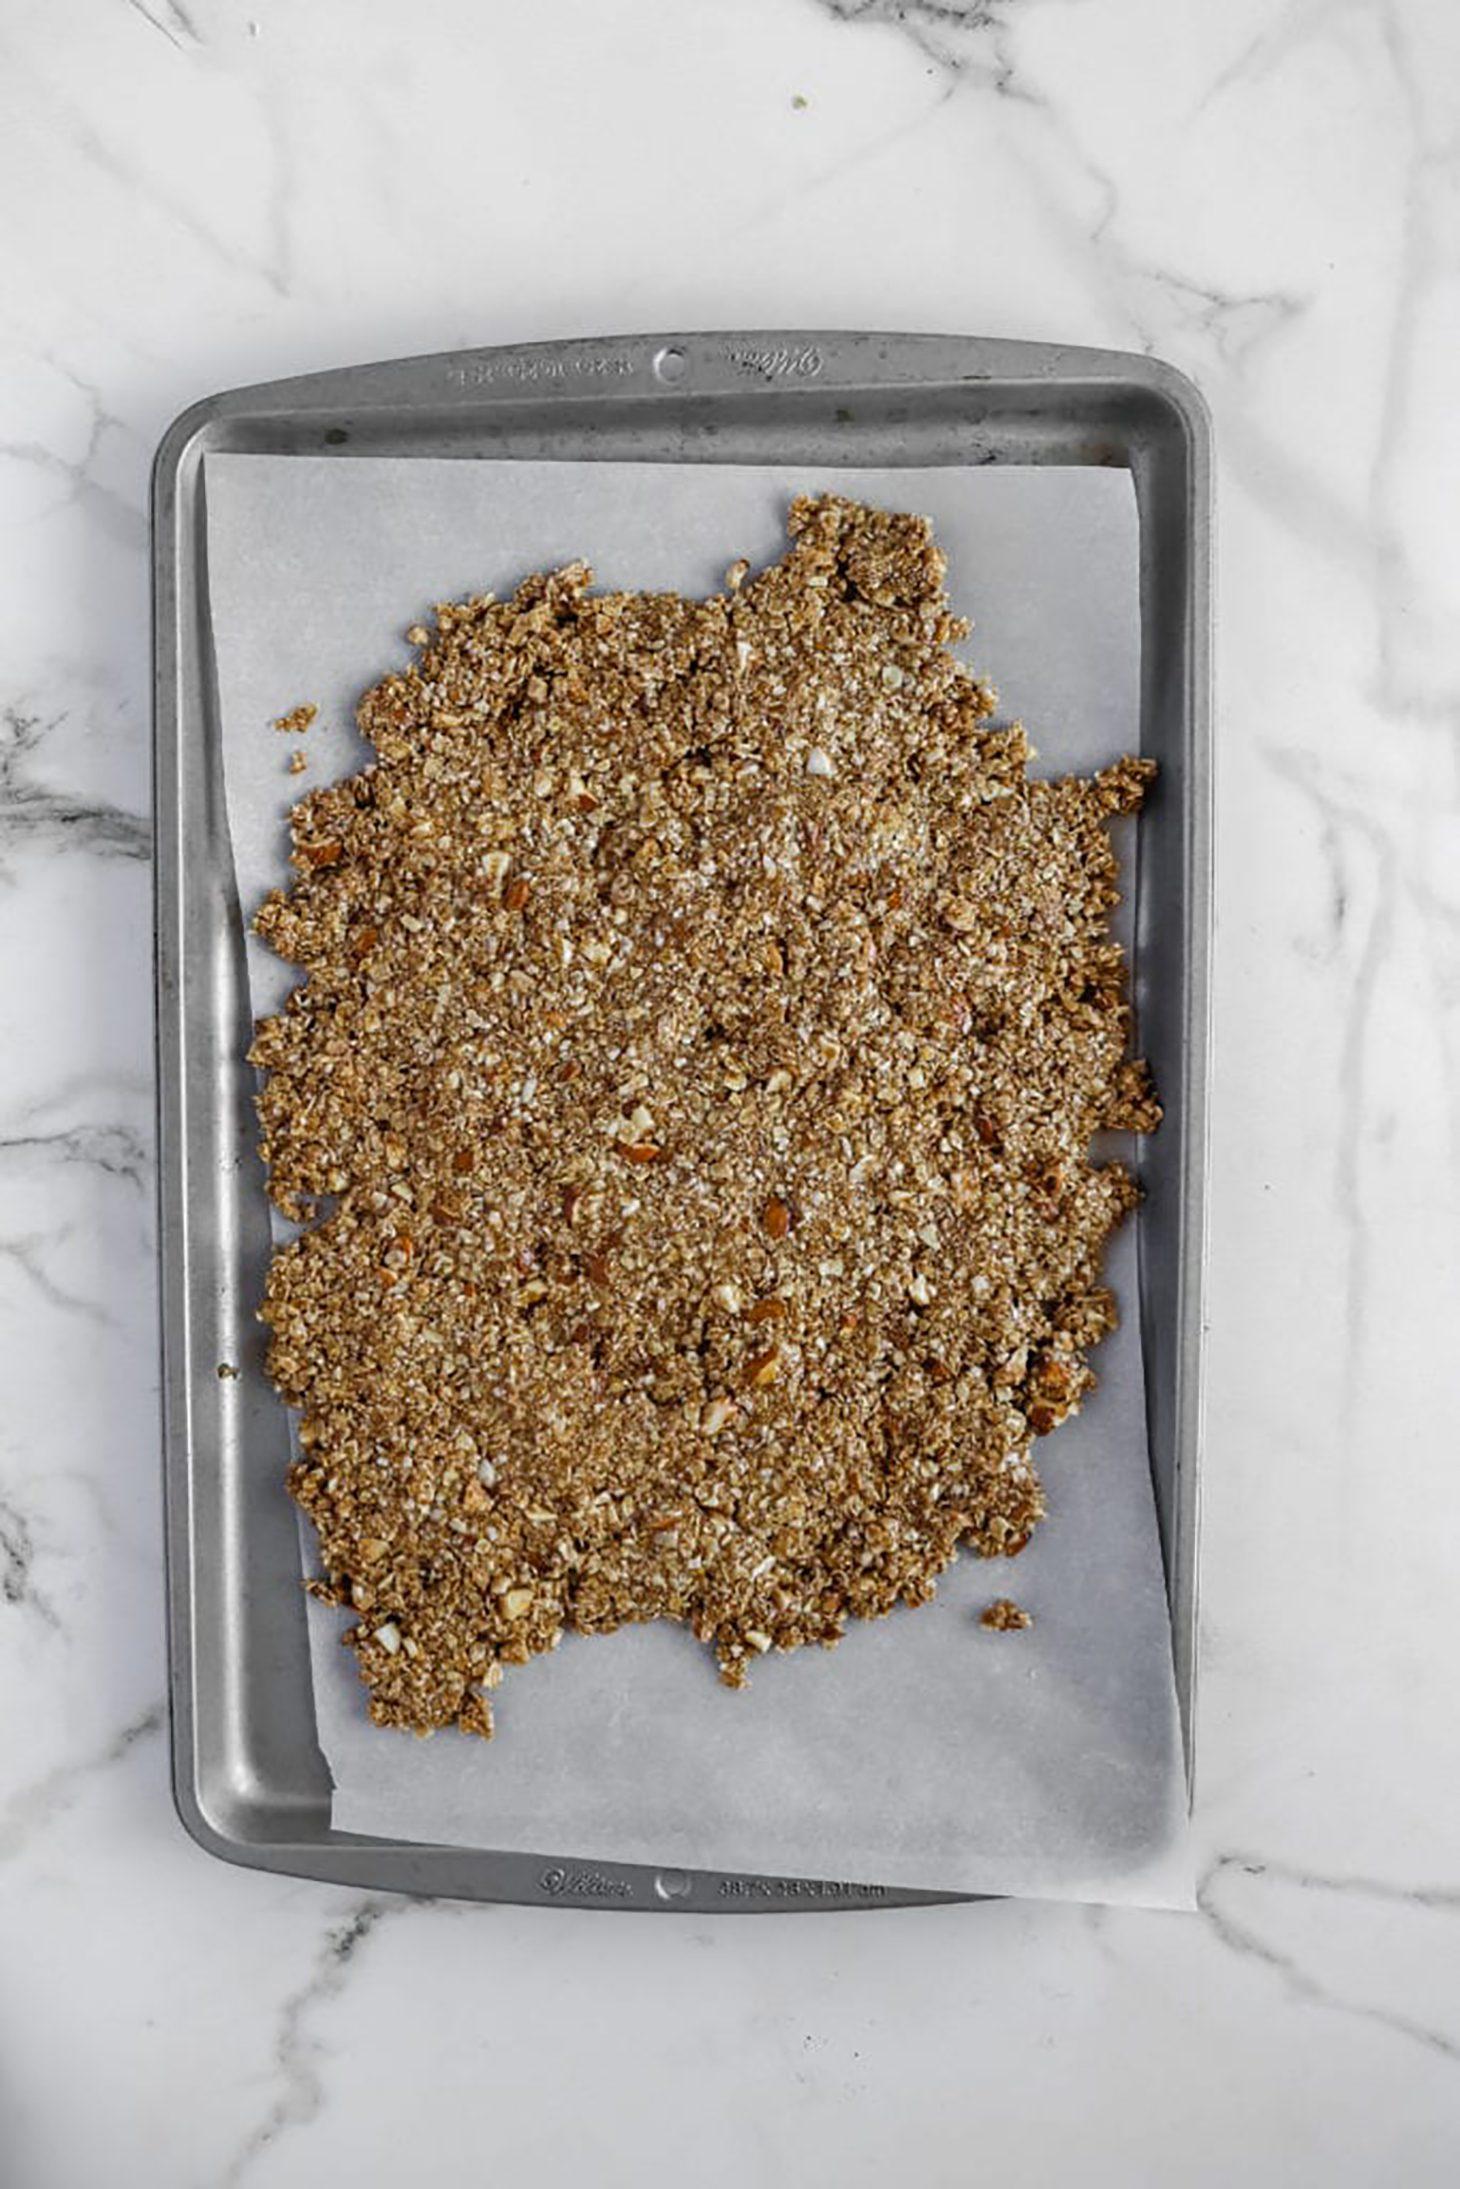 How to Make Granola At Home